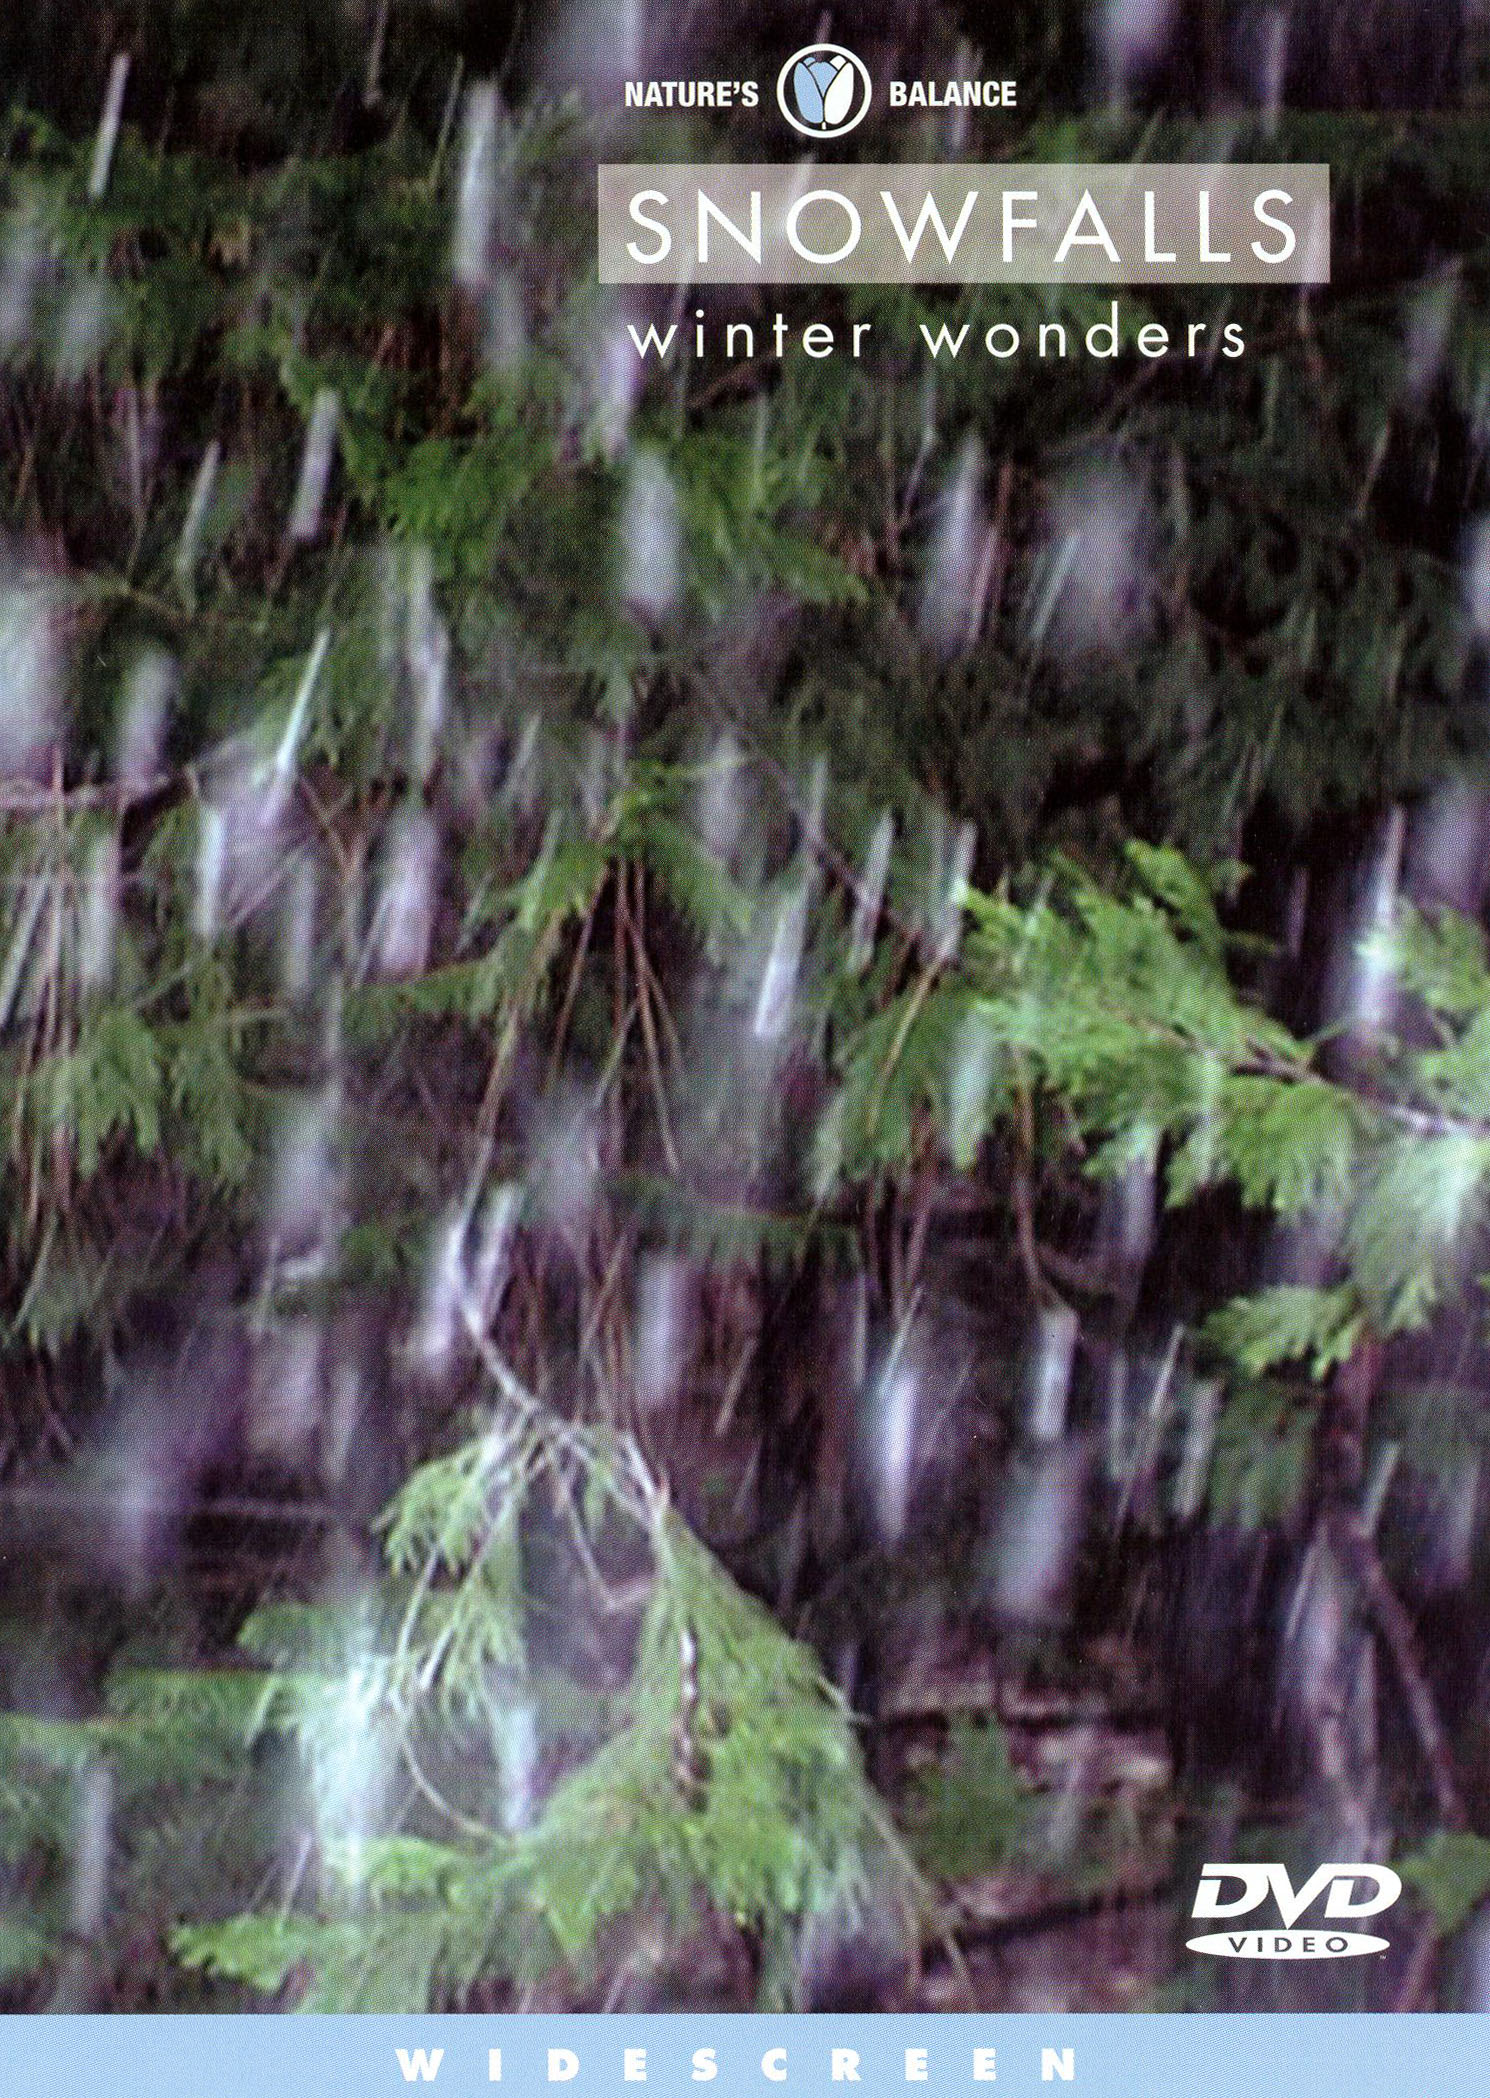 Nature's Balance: Snowfalls